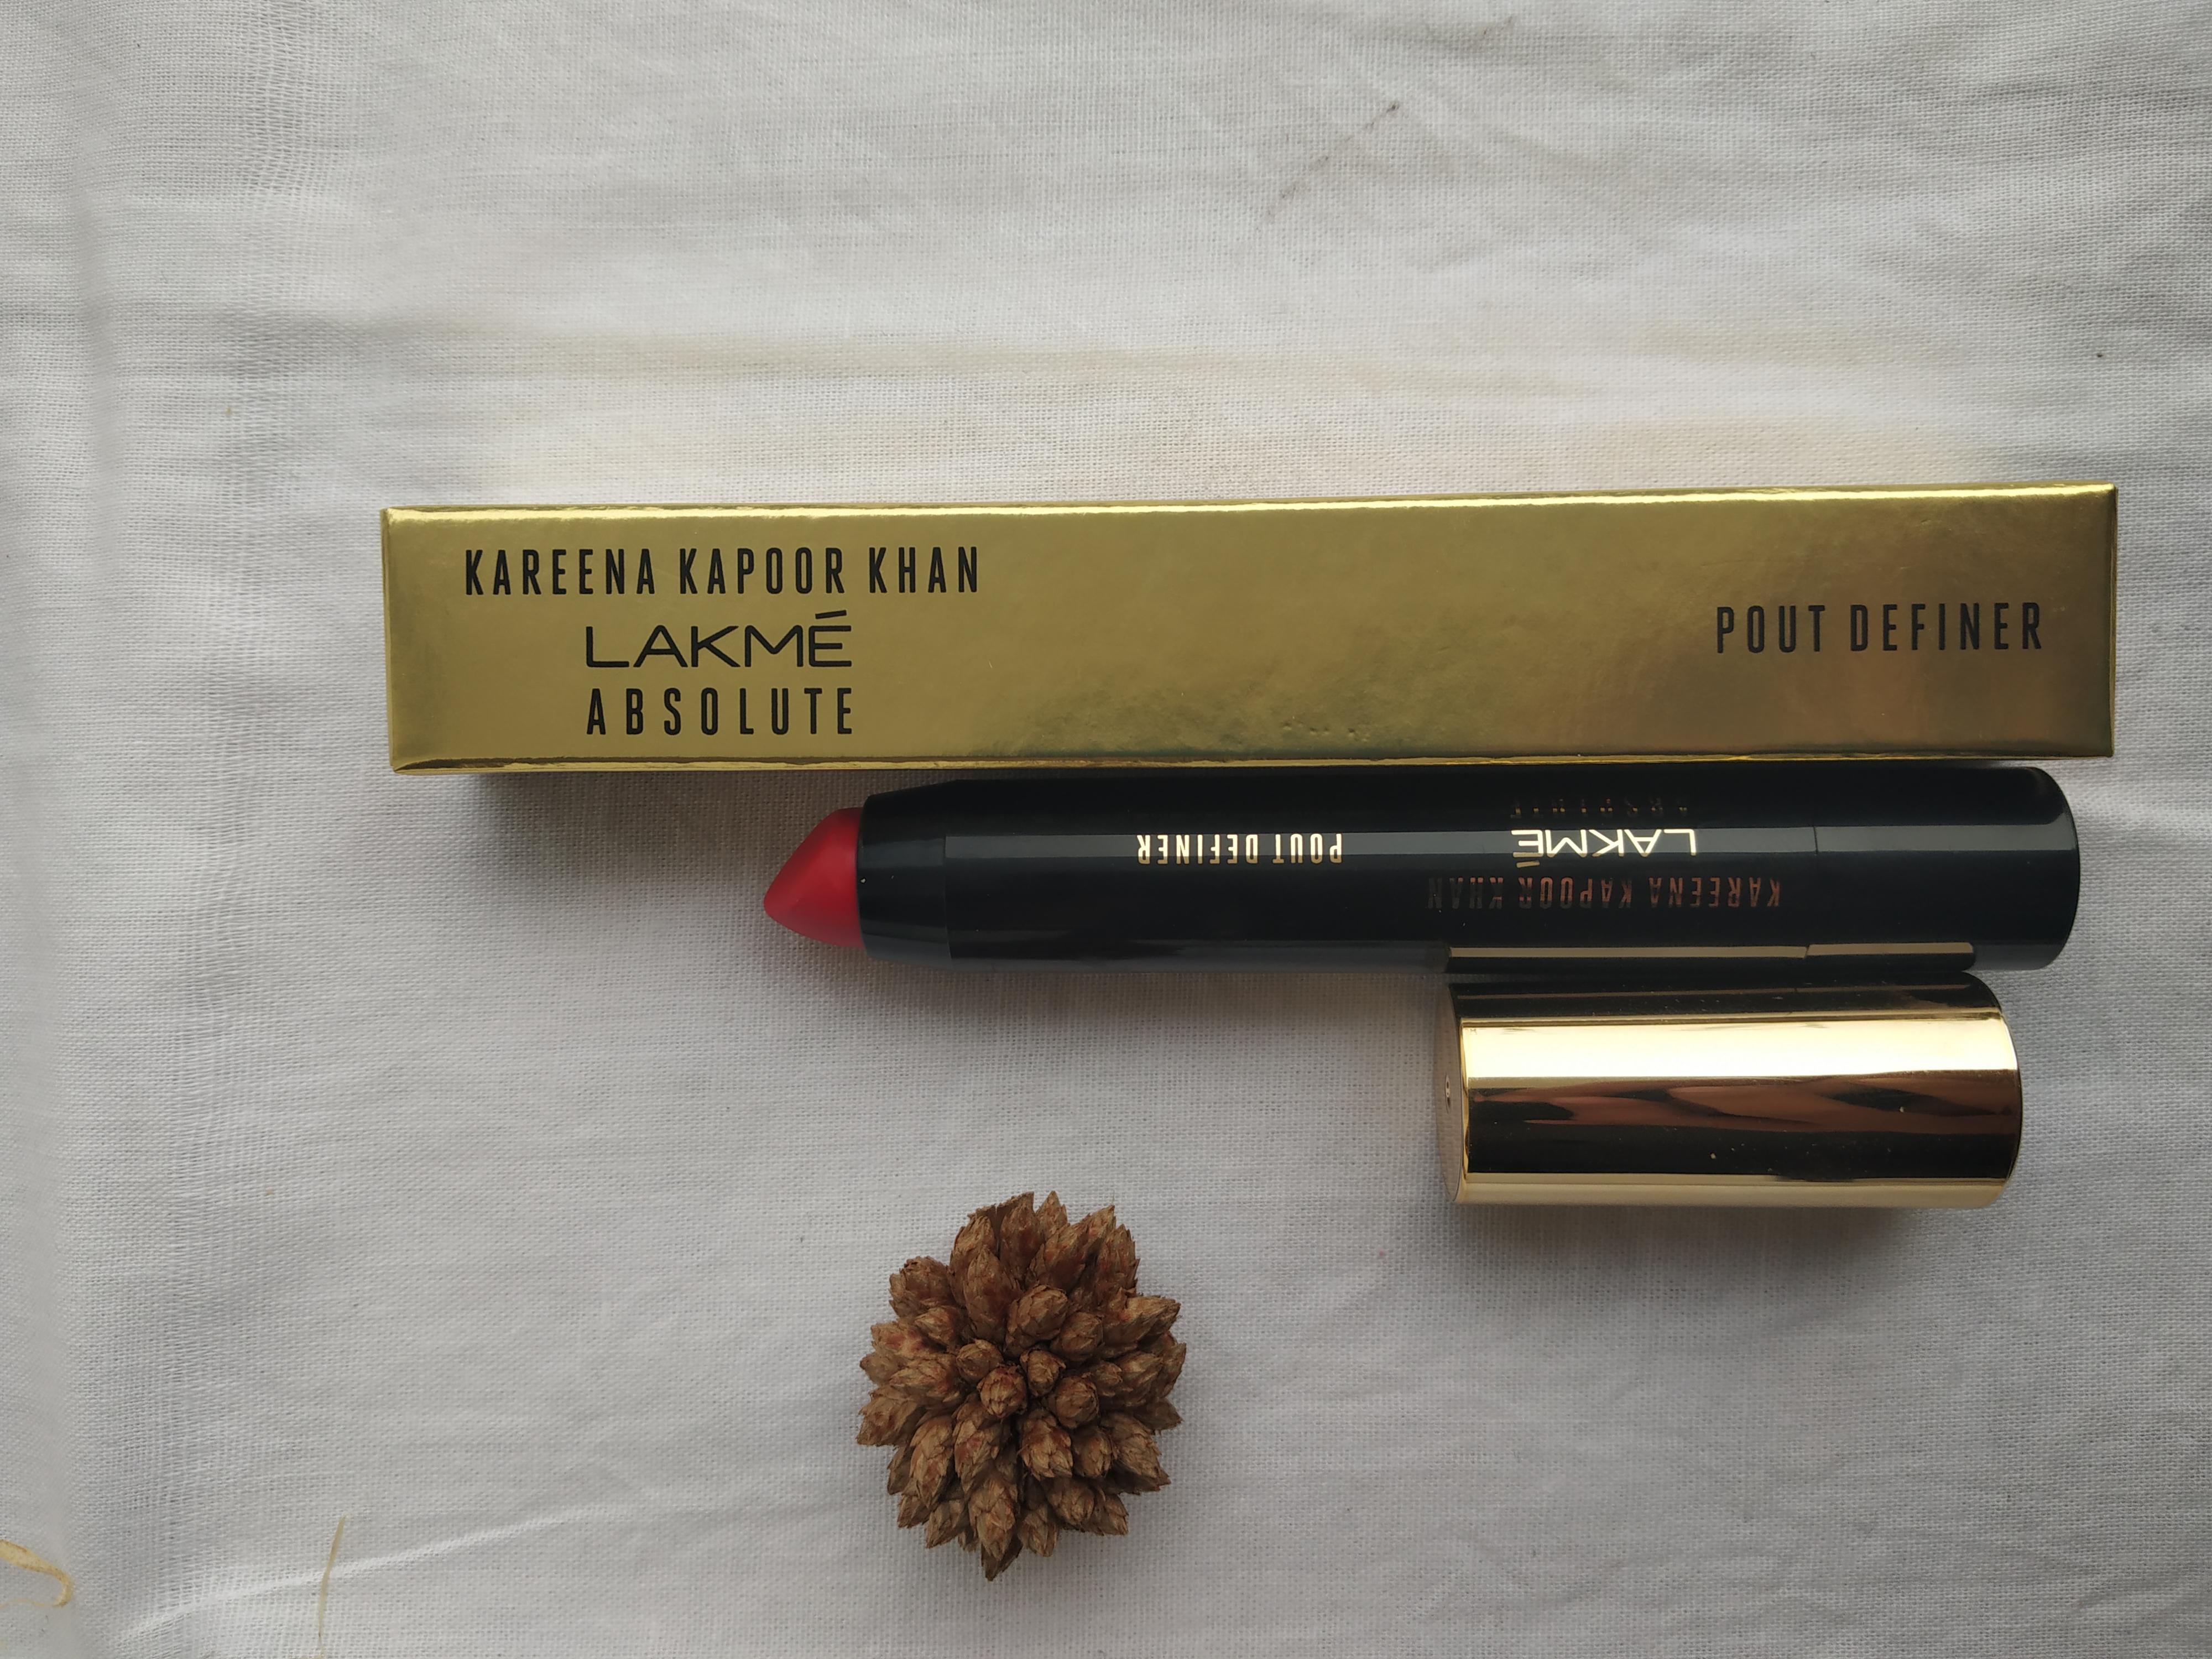 Lakme Kareena Kapoor Khan Absolute Pout Definer-Lipstick-By ritu_rajput